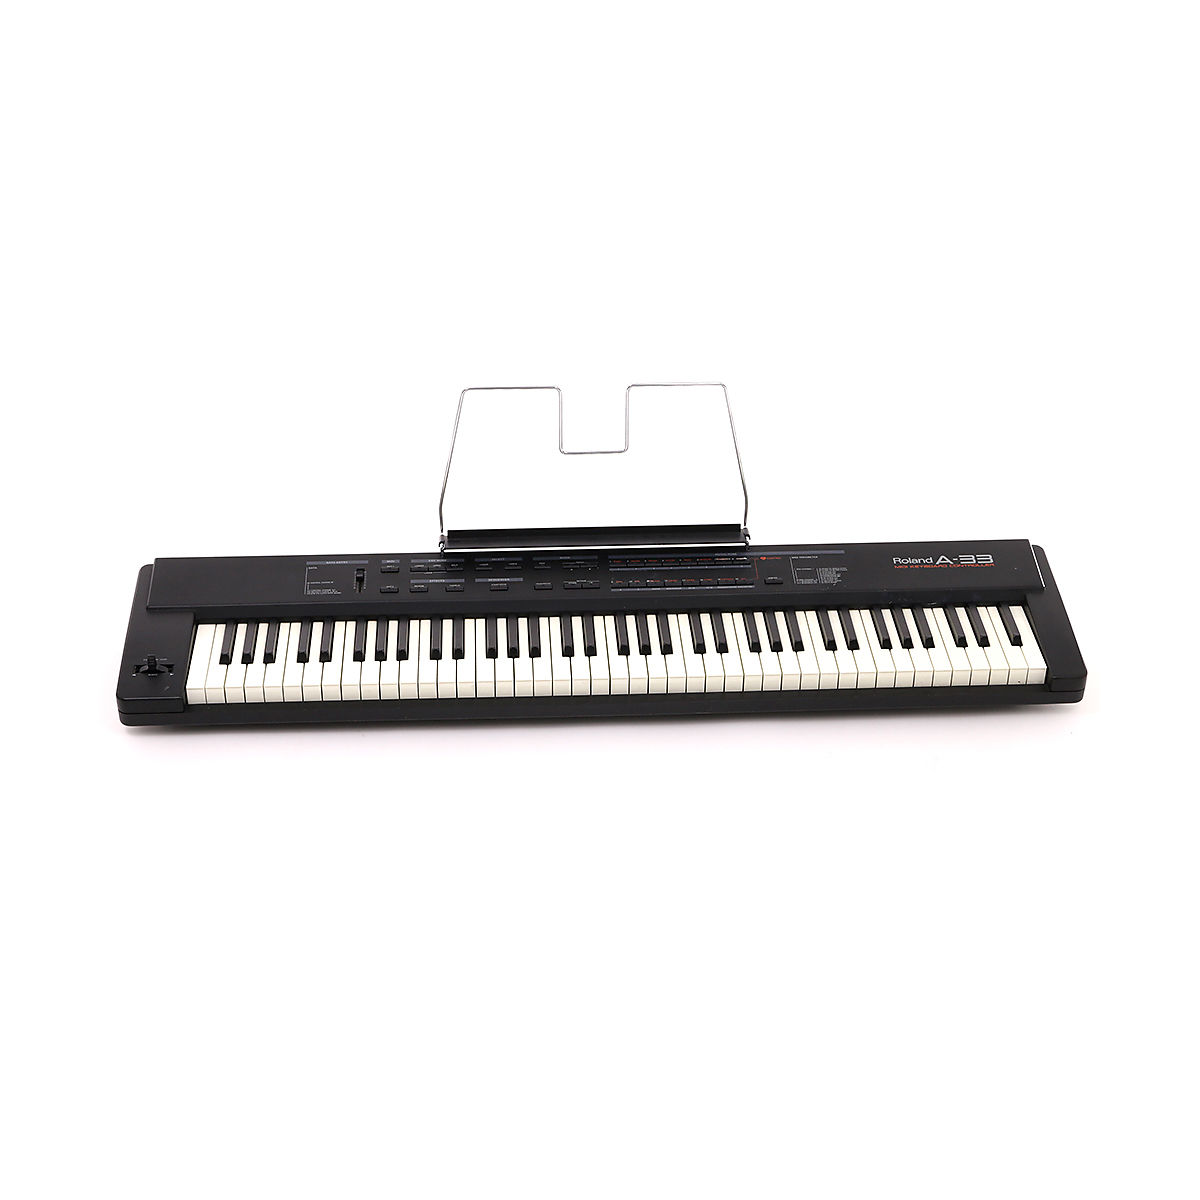 roland a 33 76 key midi keyboard controller reverb. Black Bedroom Furniture Sets. Home Design Ideas